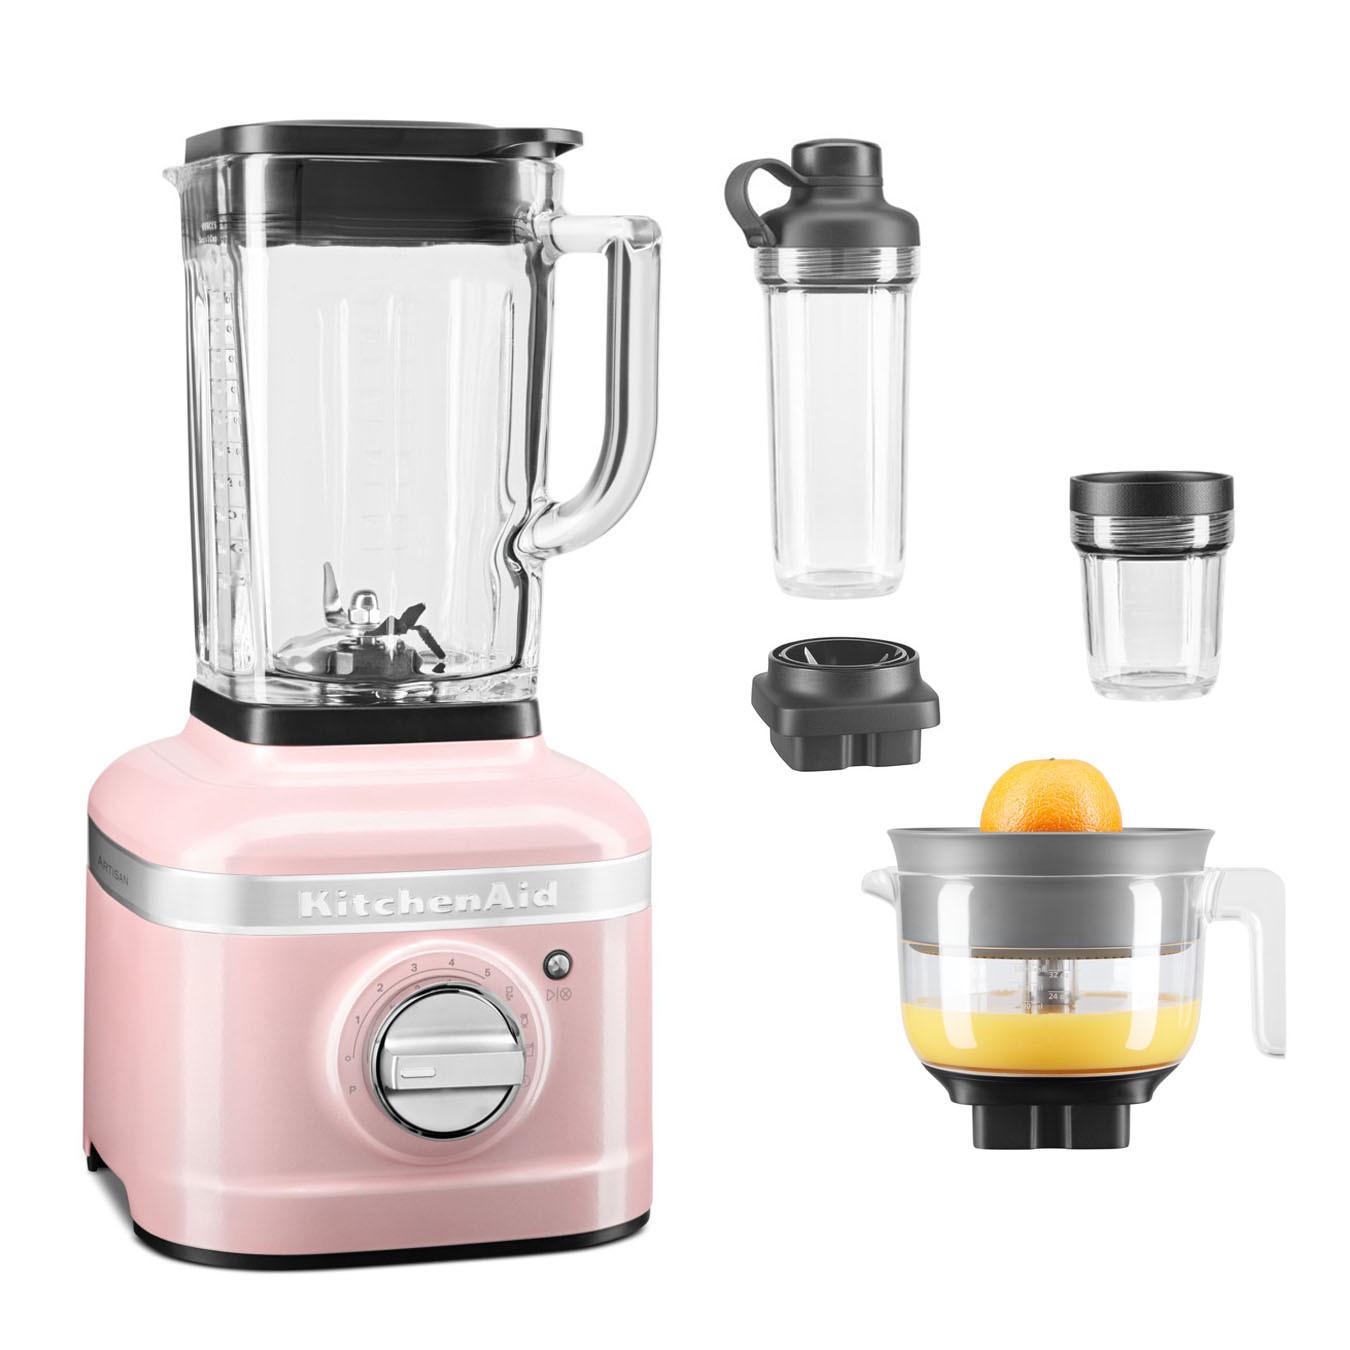 KitchenAid ARTISAN K400 Standmixer pink 5KSB4026ESP